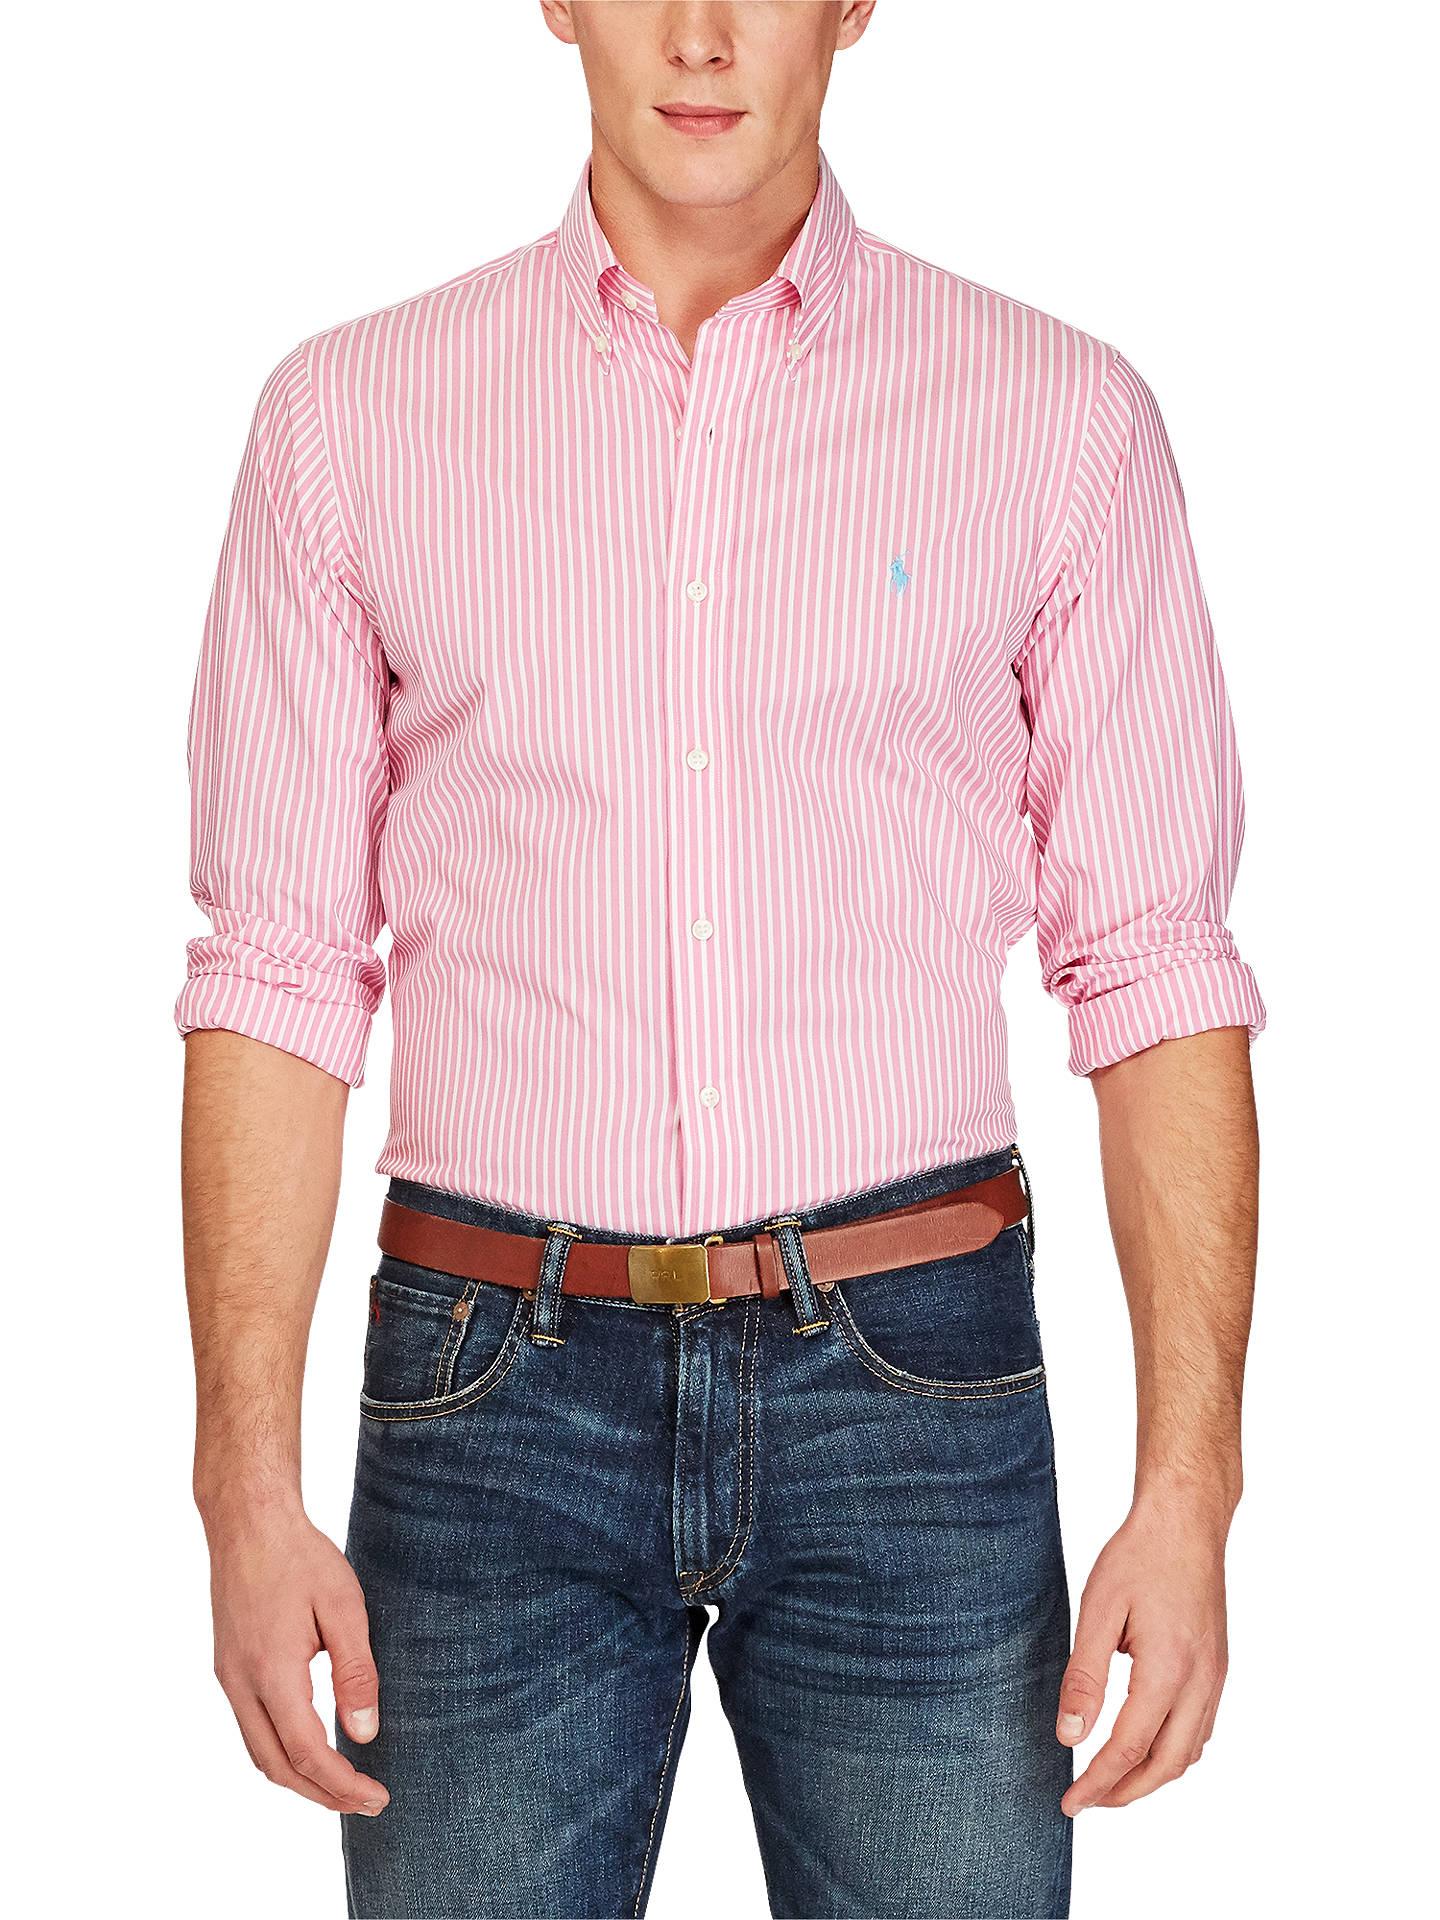 fc2ea968e0b5 Buy Polo Ralph Lauren Slim Fit Striped Cotton Poplin Shirt